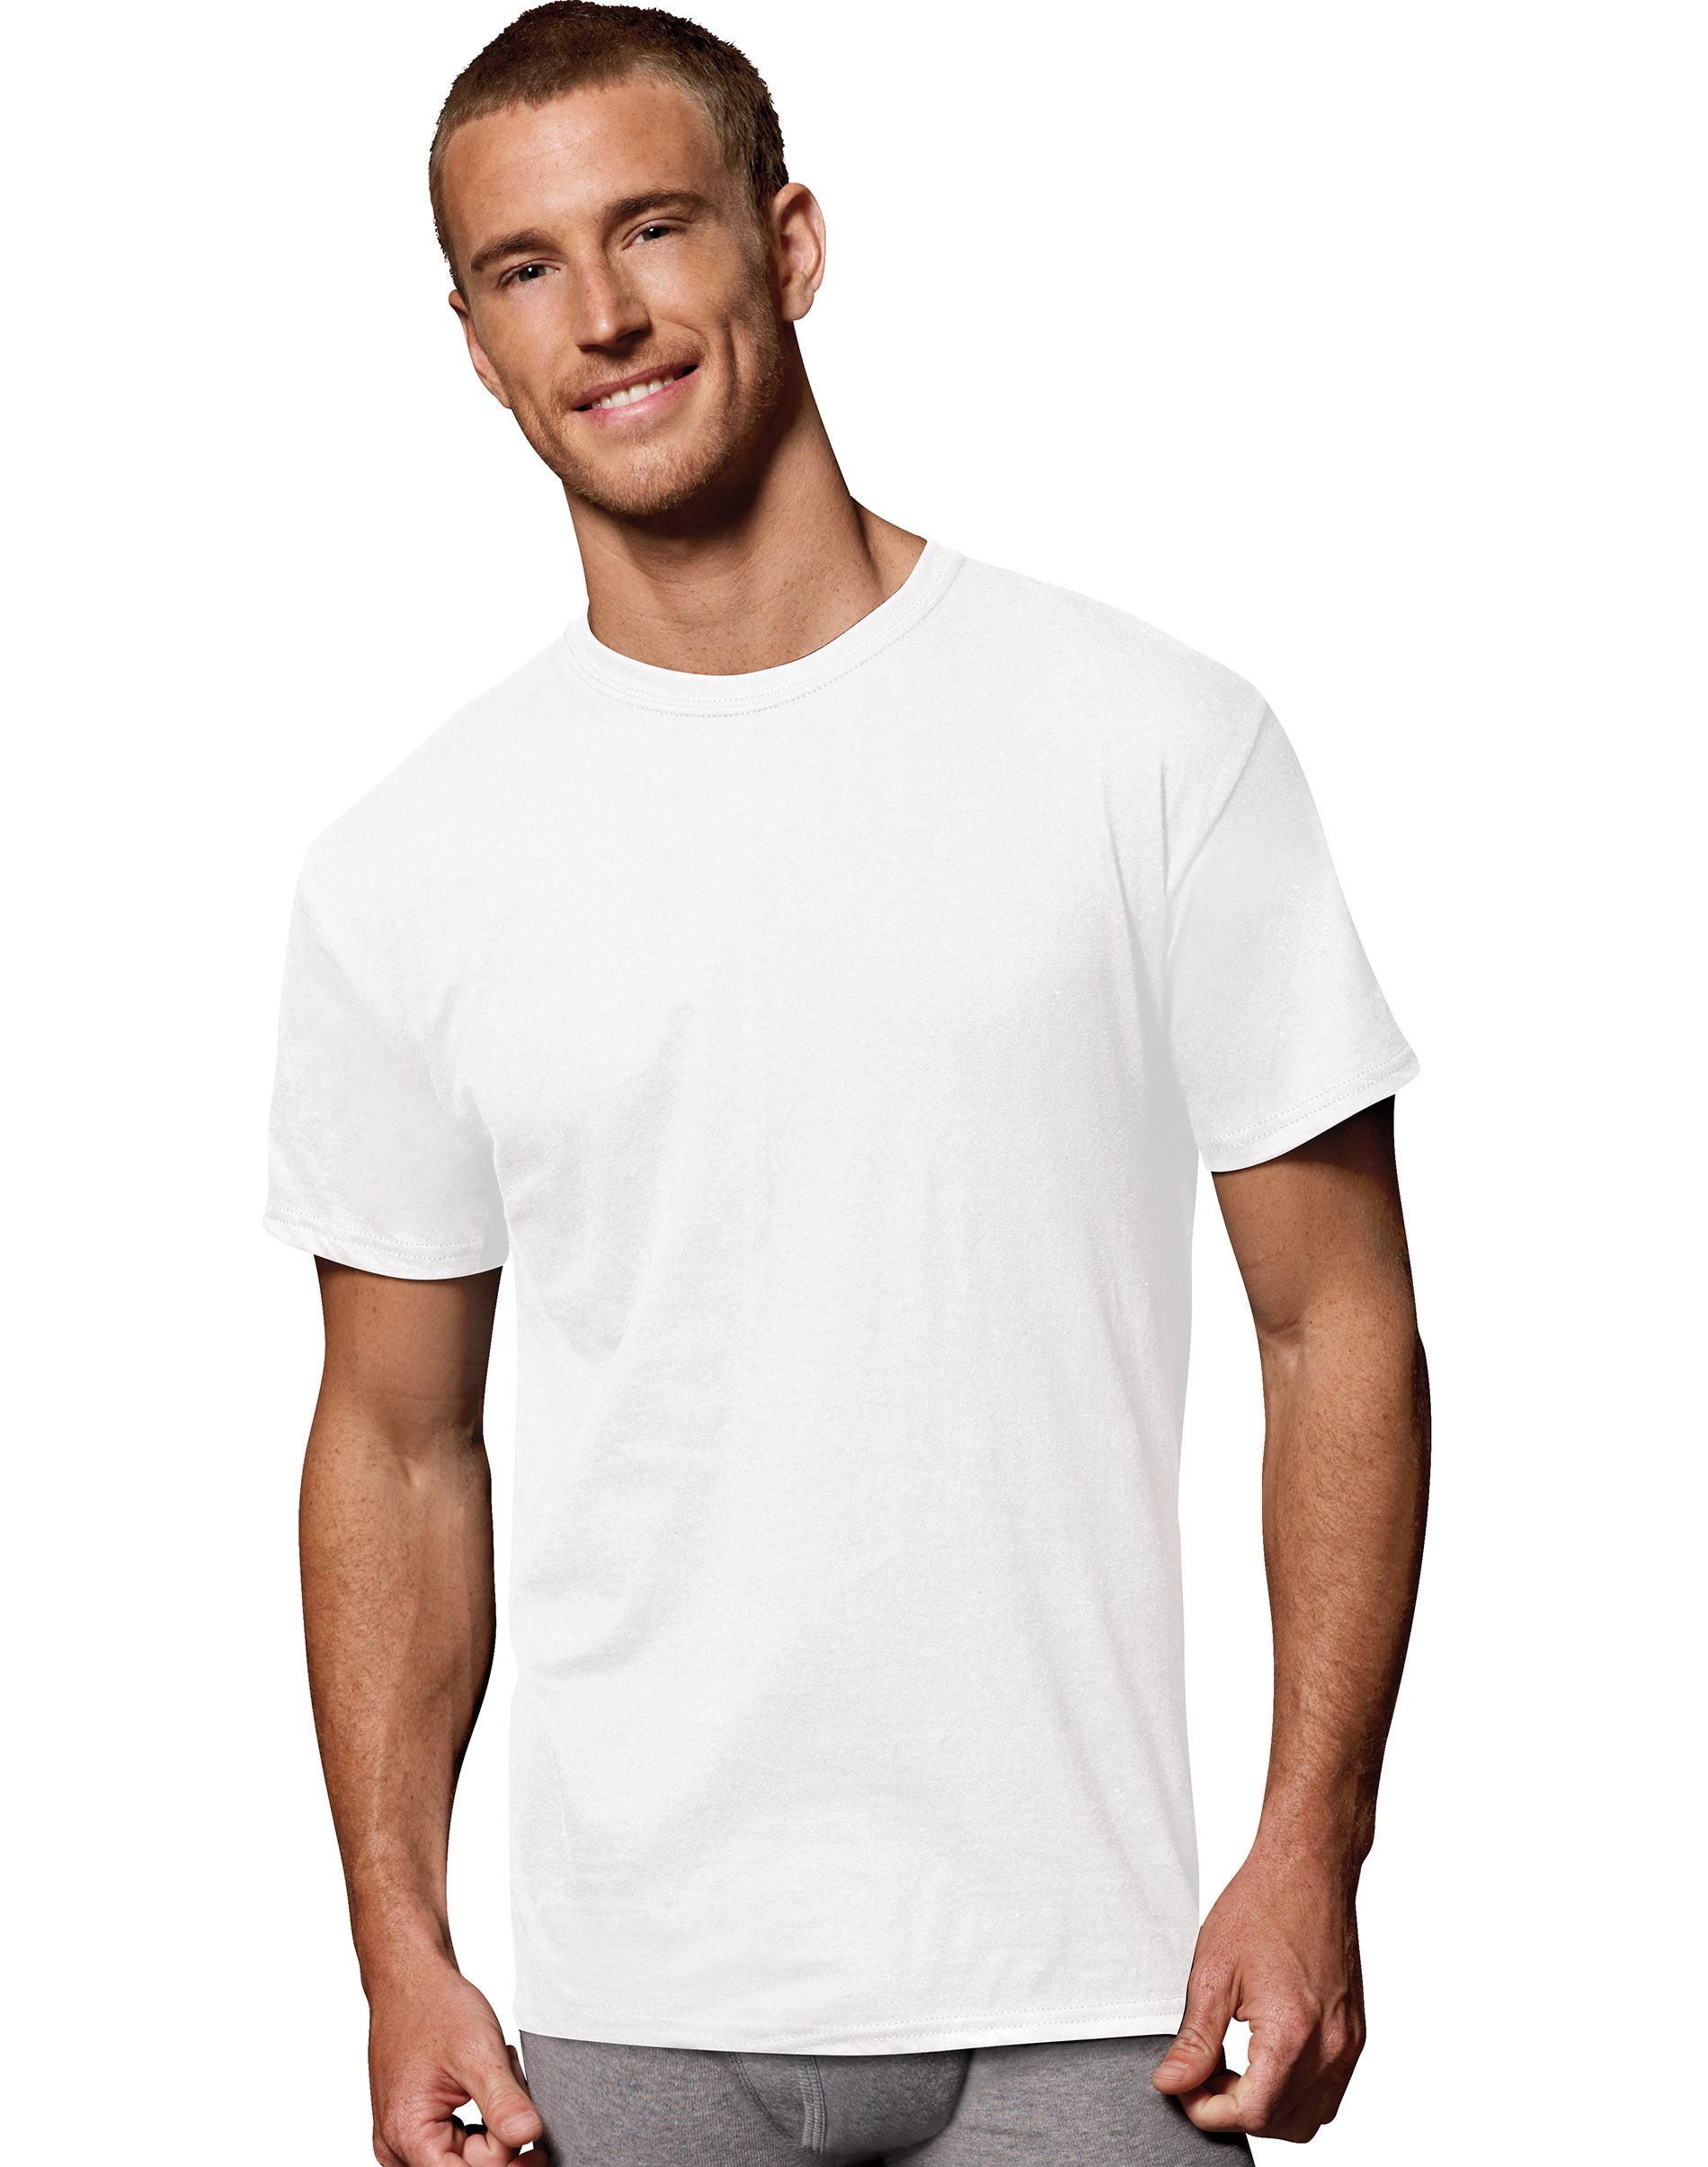 Hanes Men/'s White Crew Neck T-Shirt Undershirt Fresh IQ Odor Protection 7-PACK